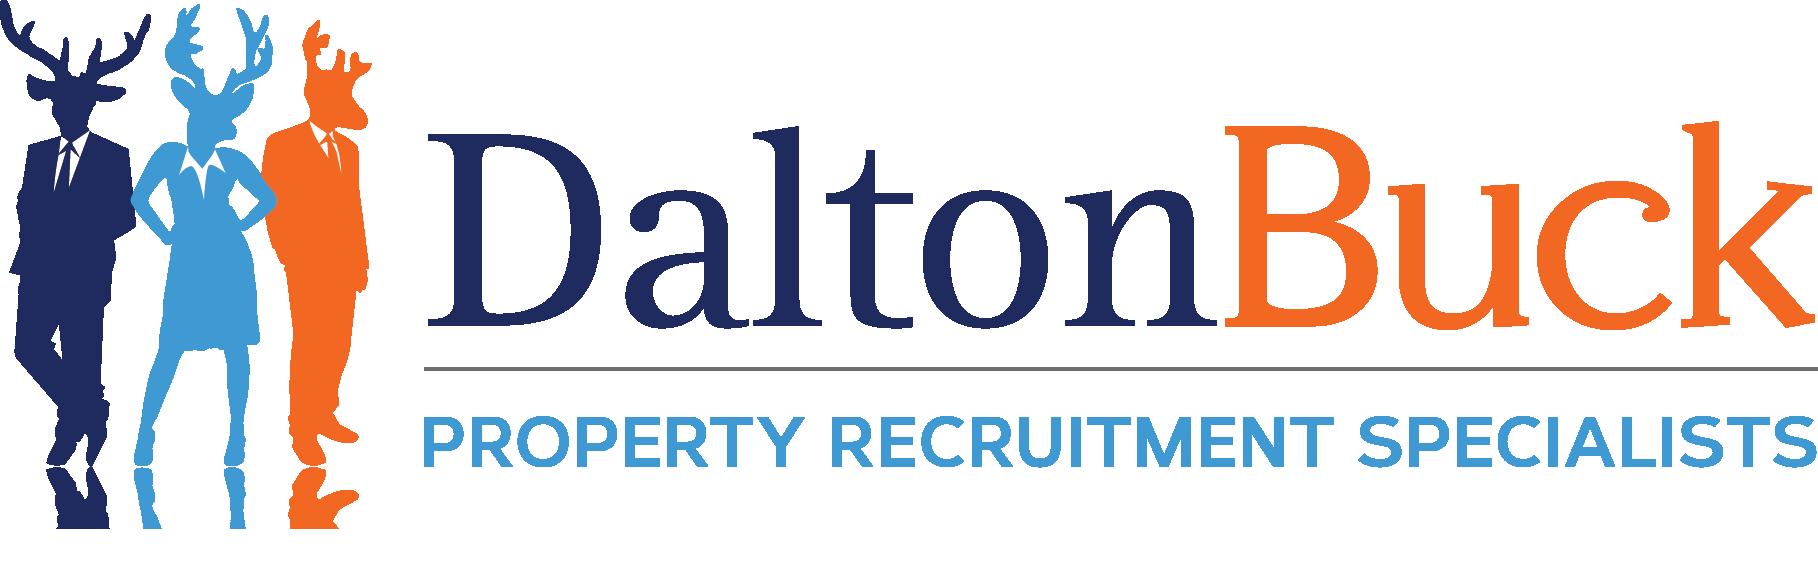 Property Recruitment Consultants